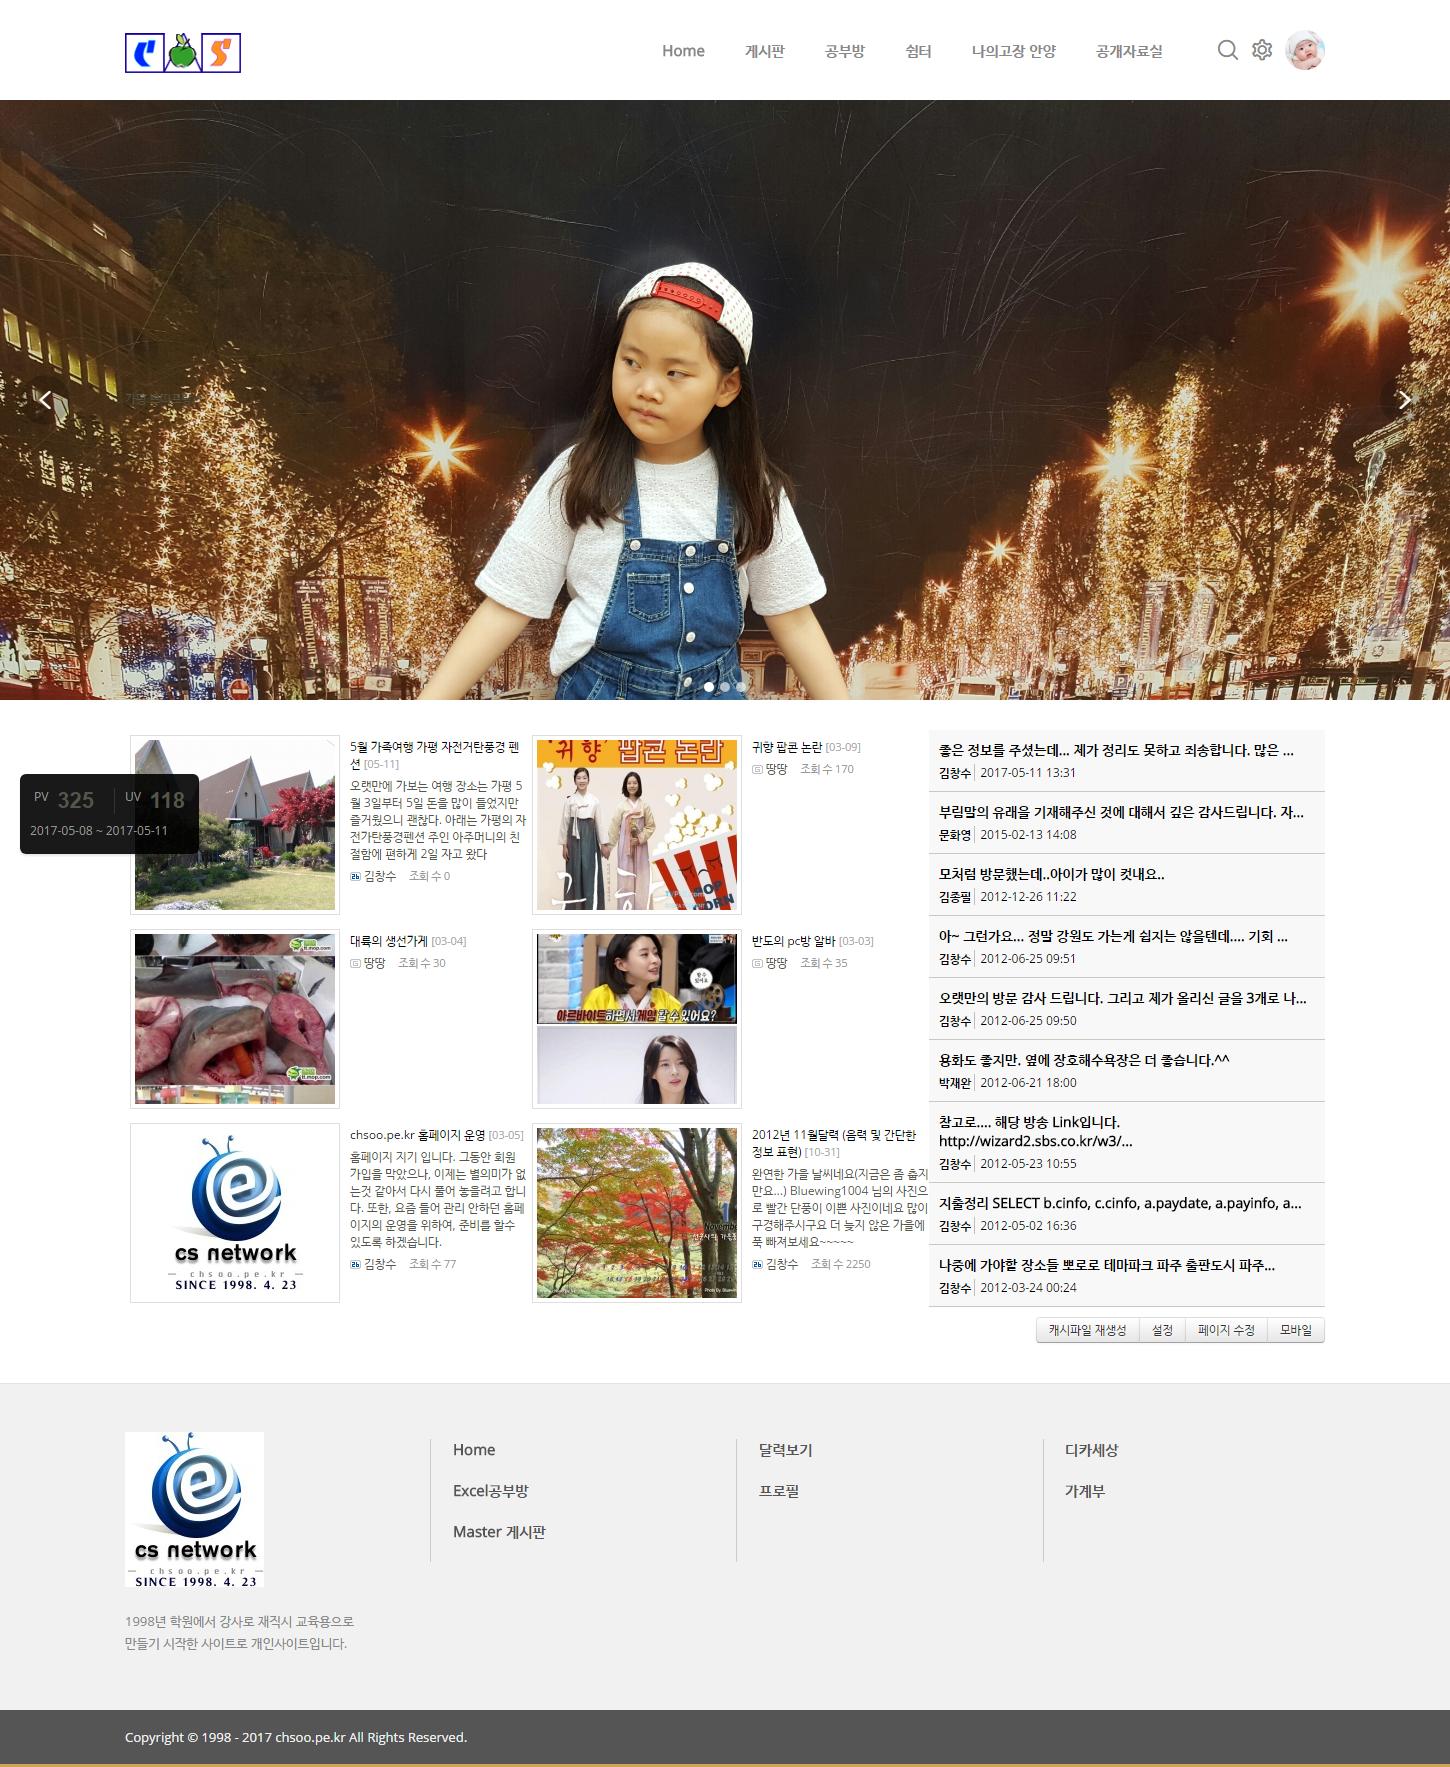 Chsoo s HomePage (1).png